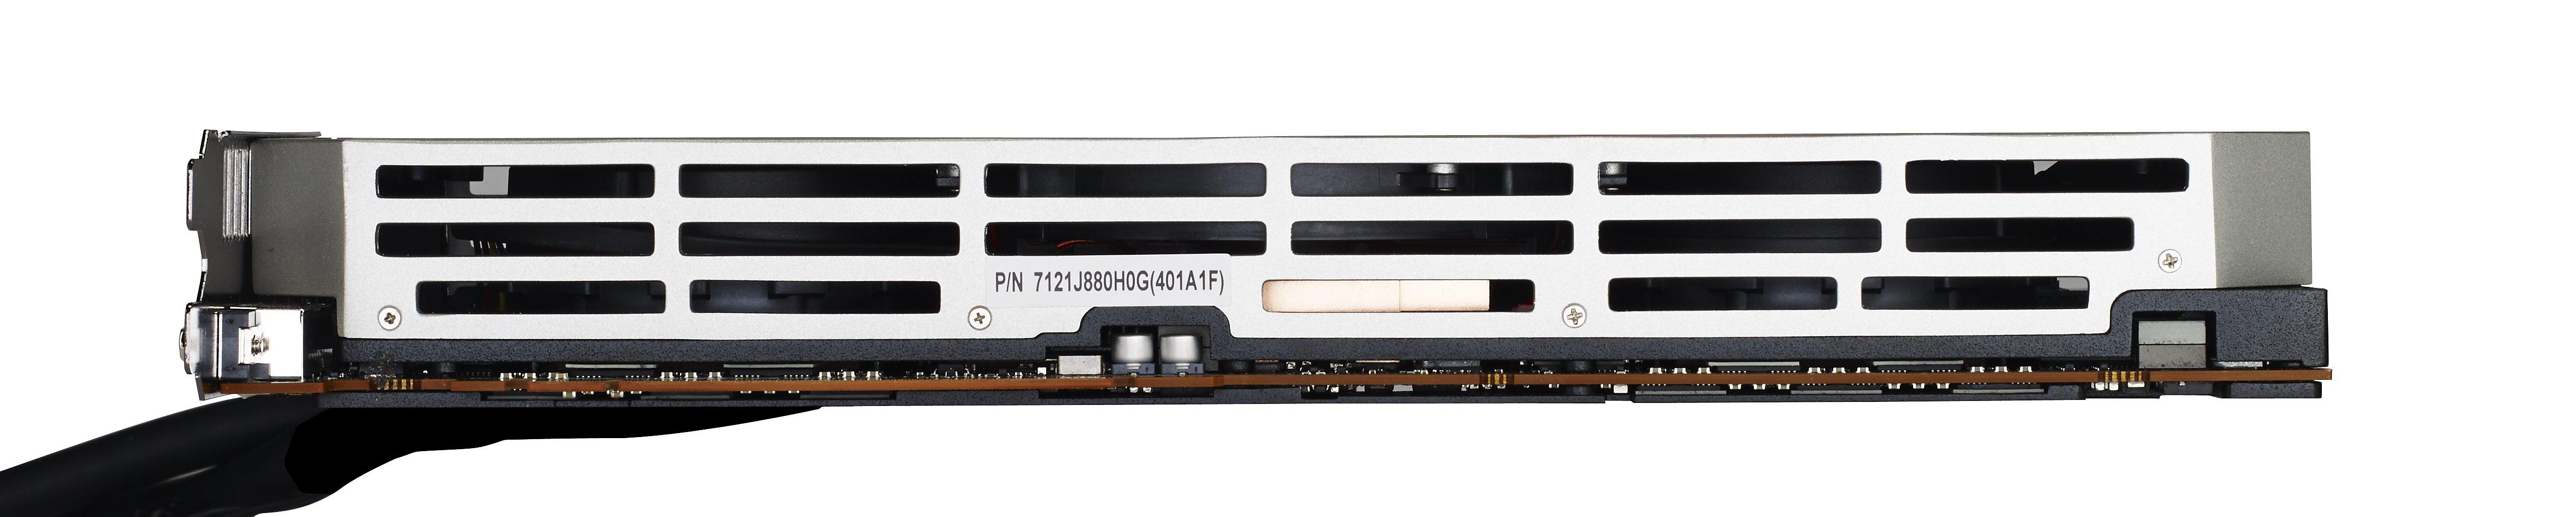 AMD Radeon R9 295X2 review | Expert Reviews